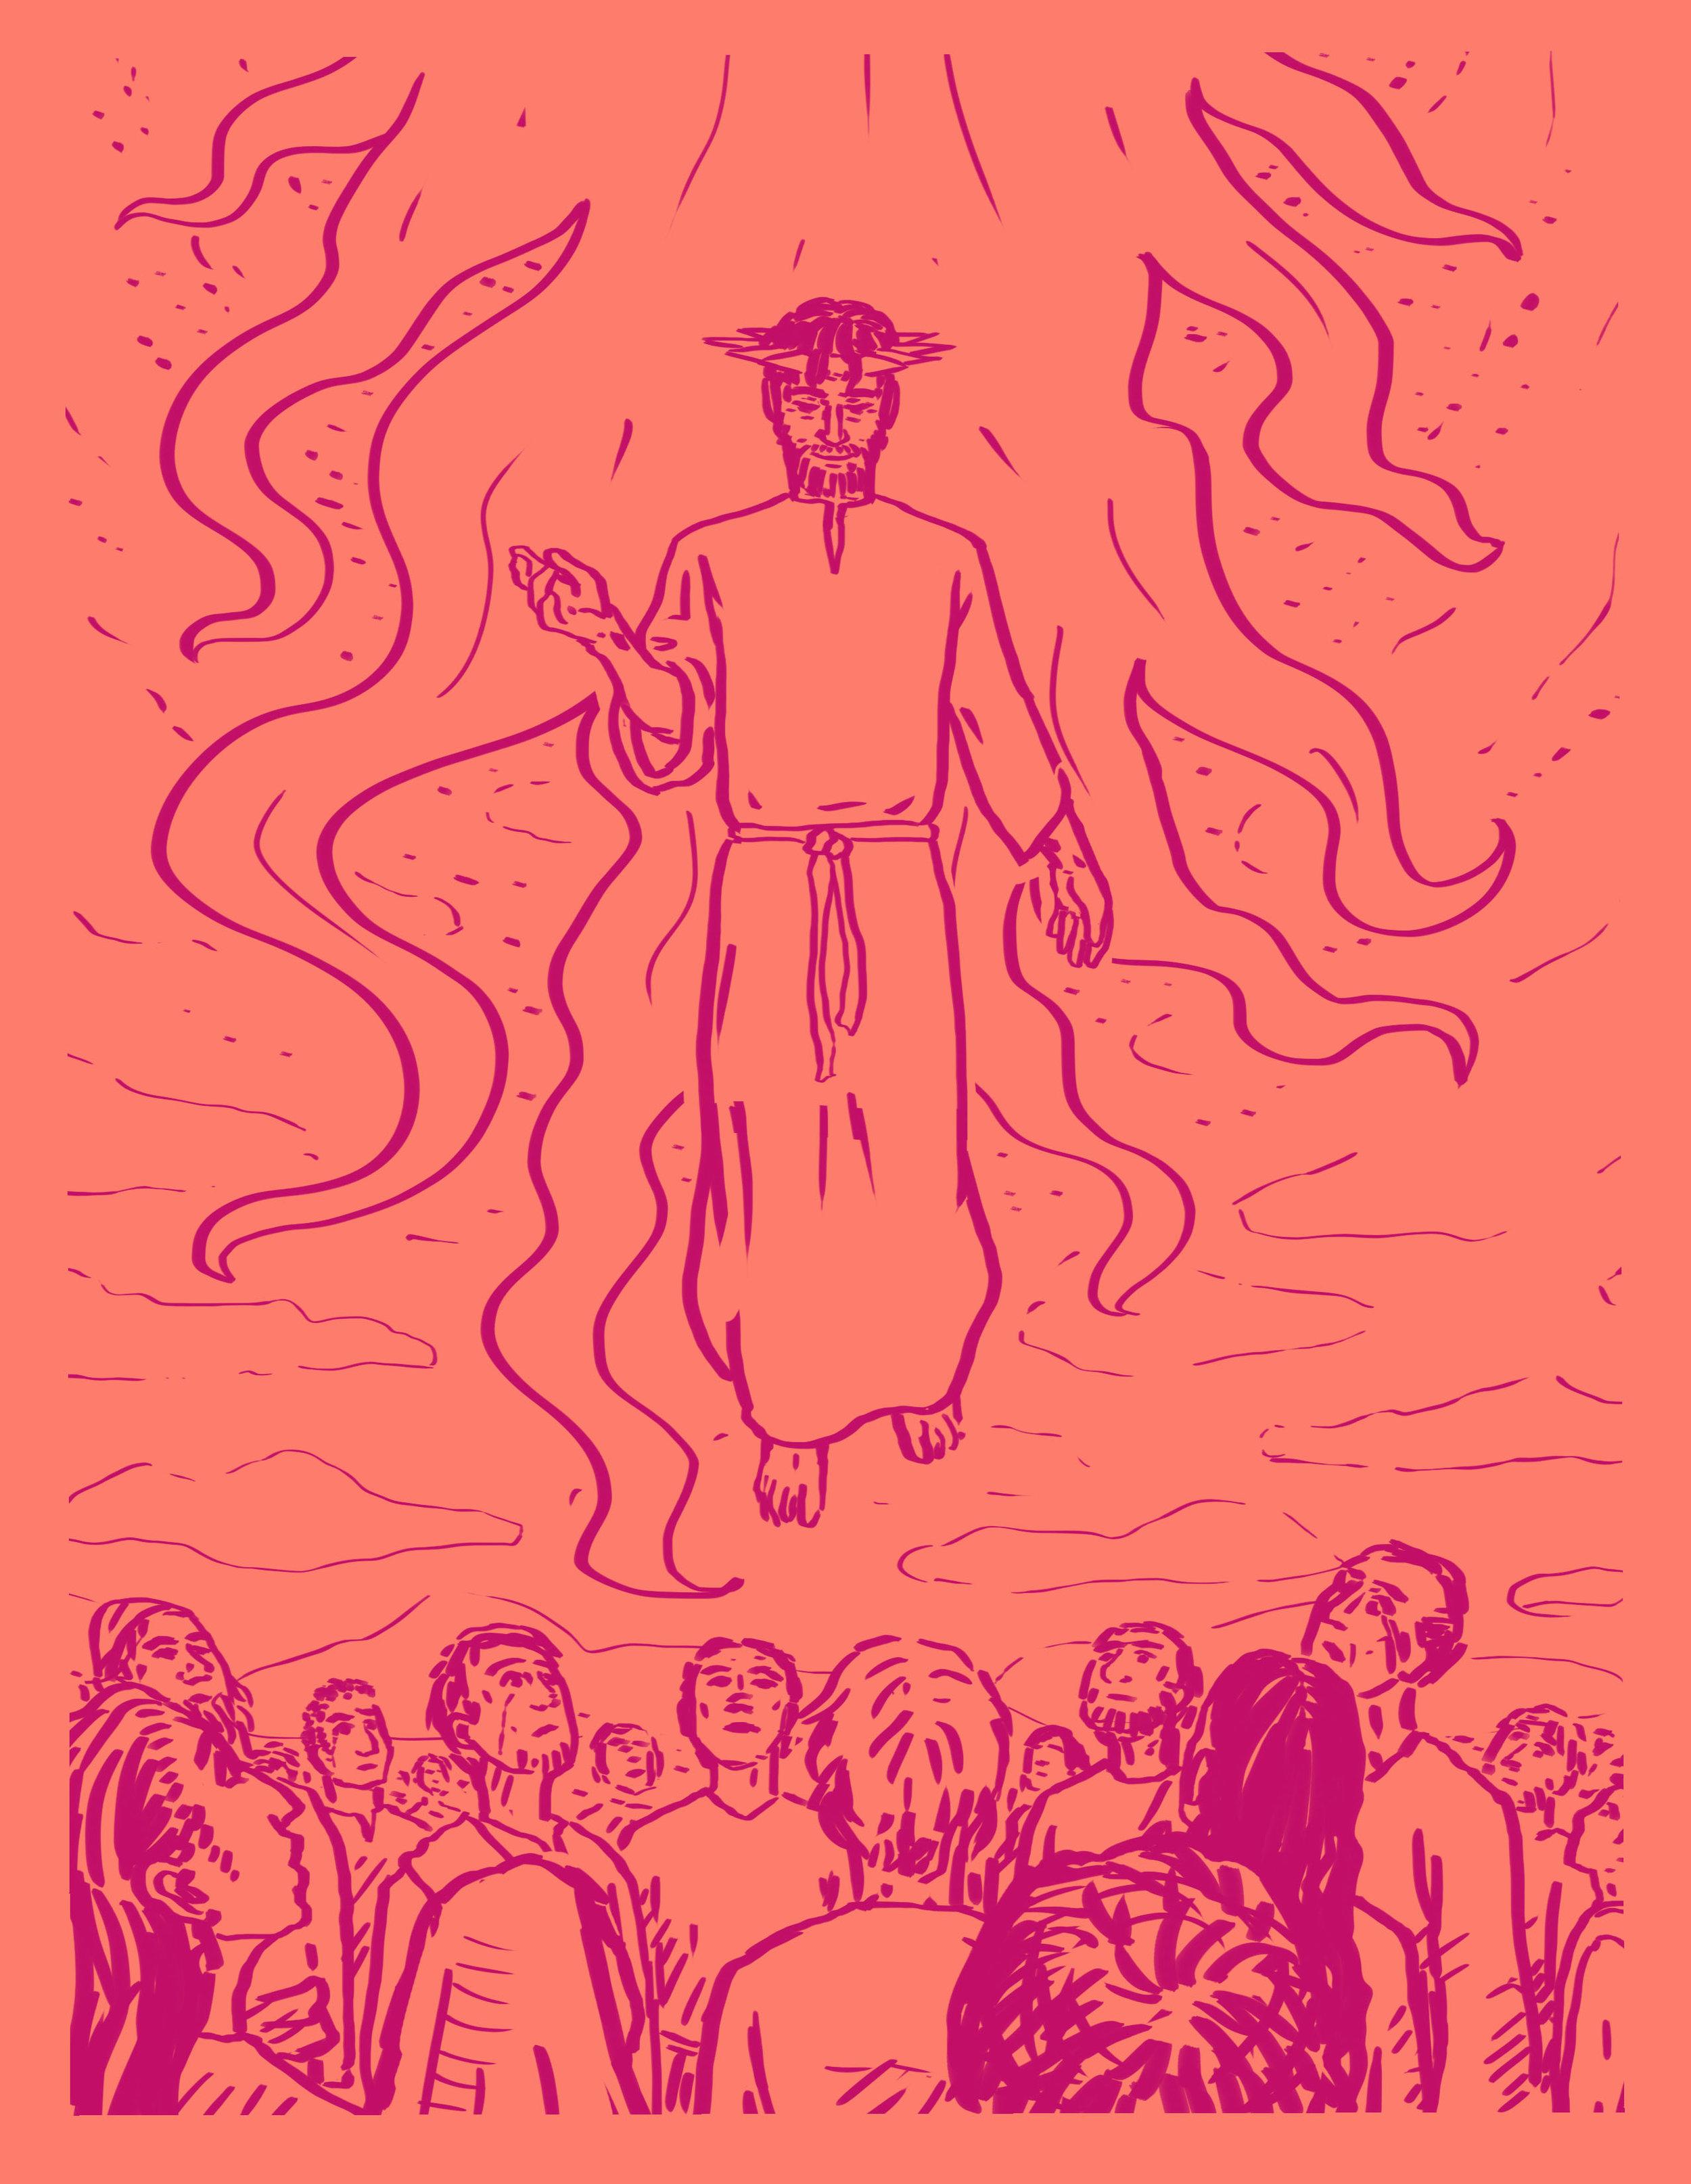 Lent Illustrations 2019Artboard 11.jpg